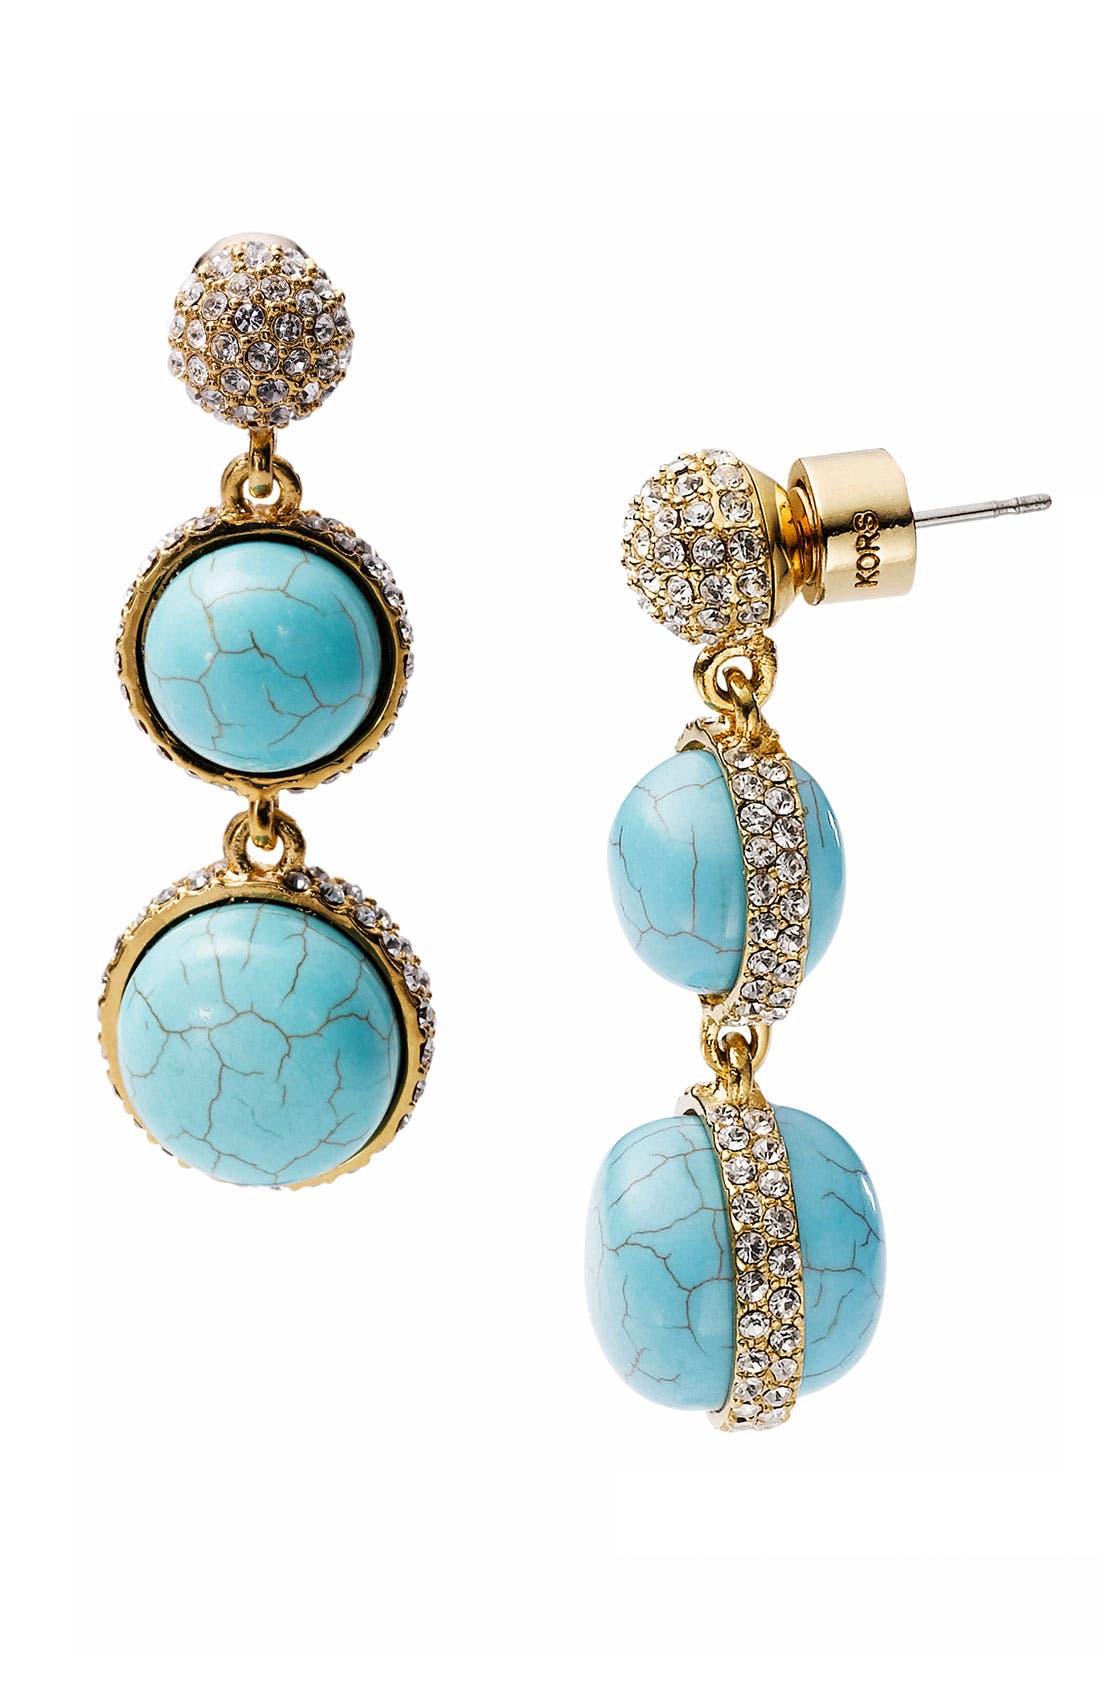 Alternate Image 1 Selected - Michael Kors 'Sleek Exotics' Double Drop Slice Earrings